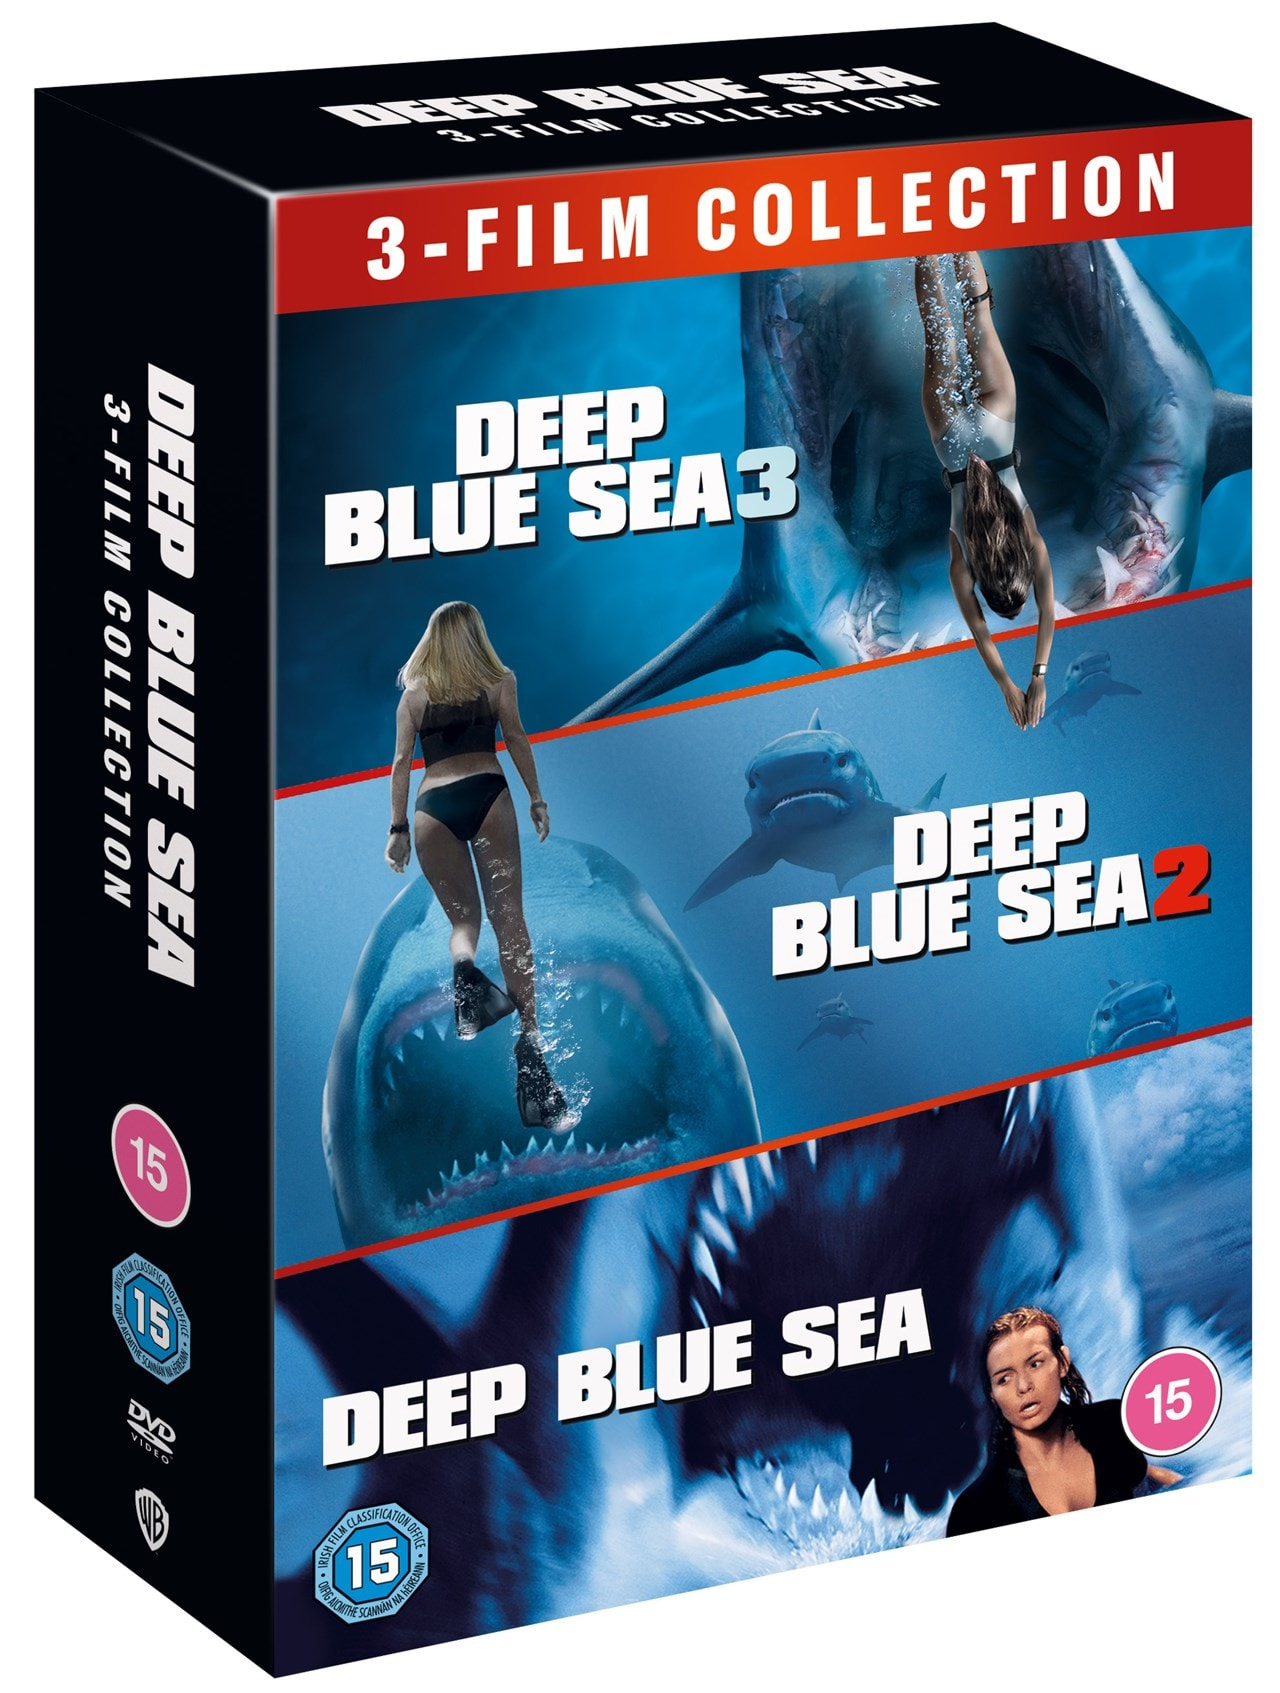 Deep Blue Sea: 3-film Collection - 2